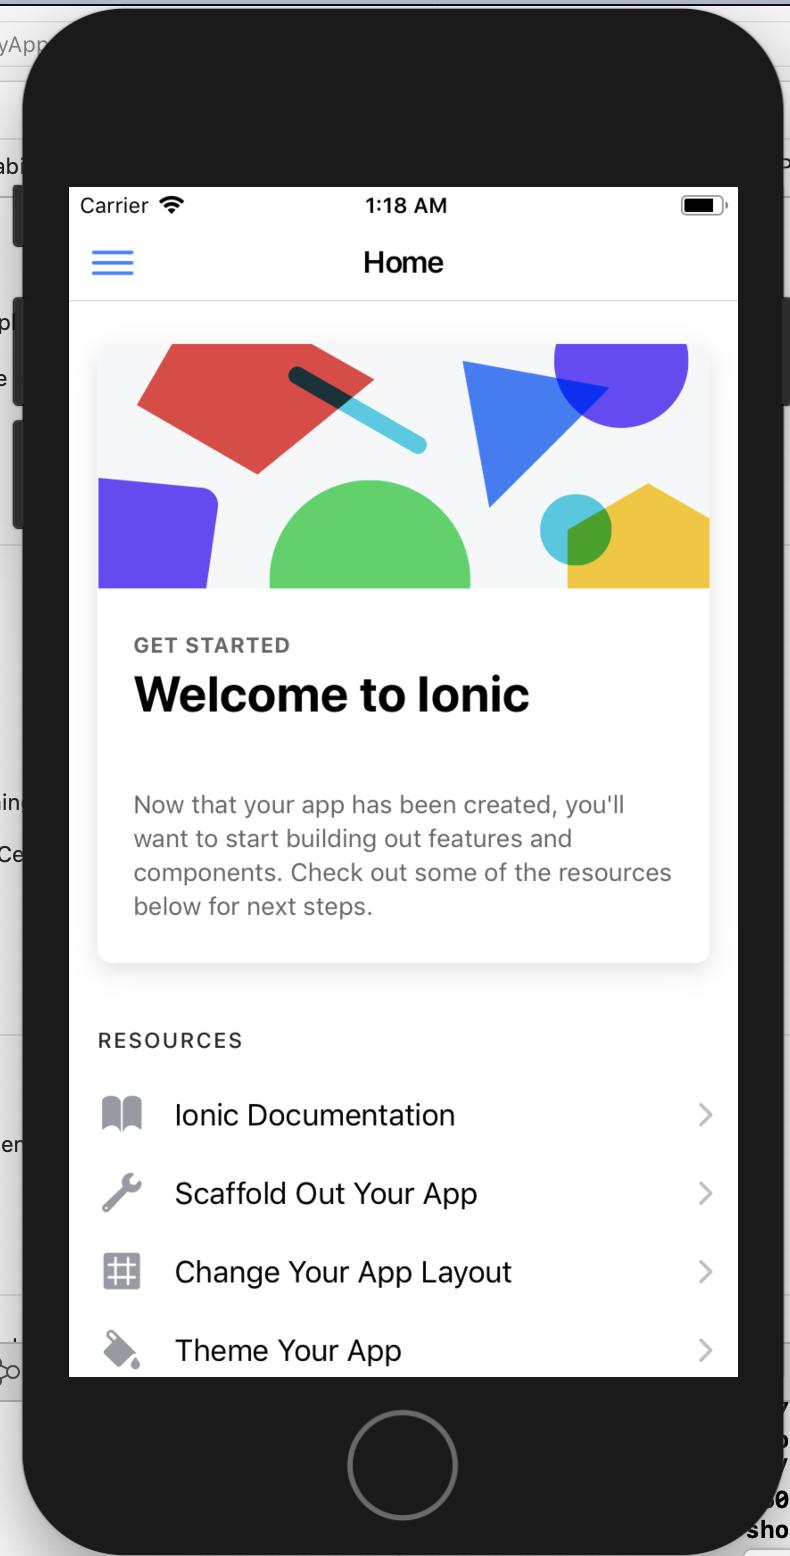 DockerでIonicチュートリアル(iOS実行ファイルビルドまで) - Qiita